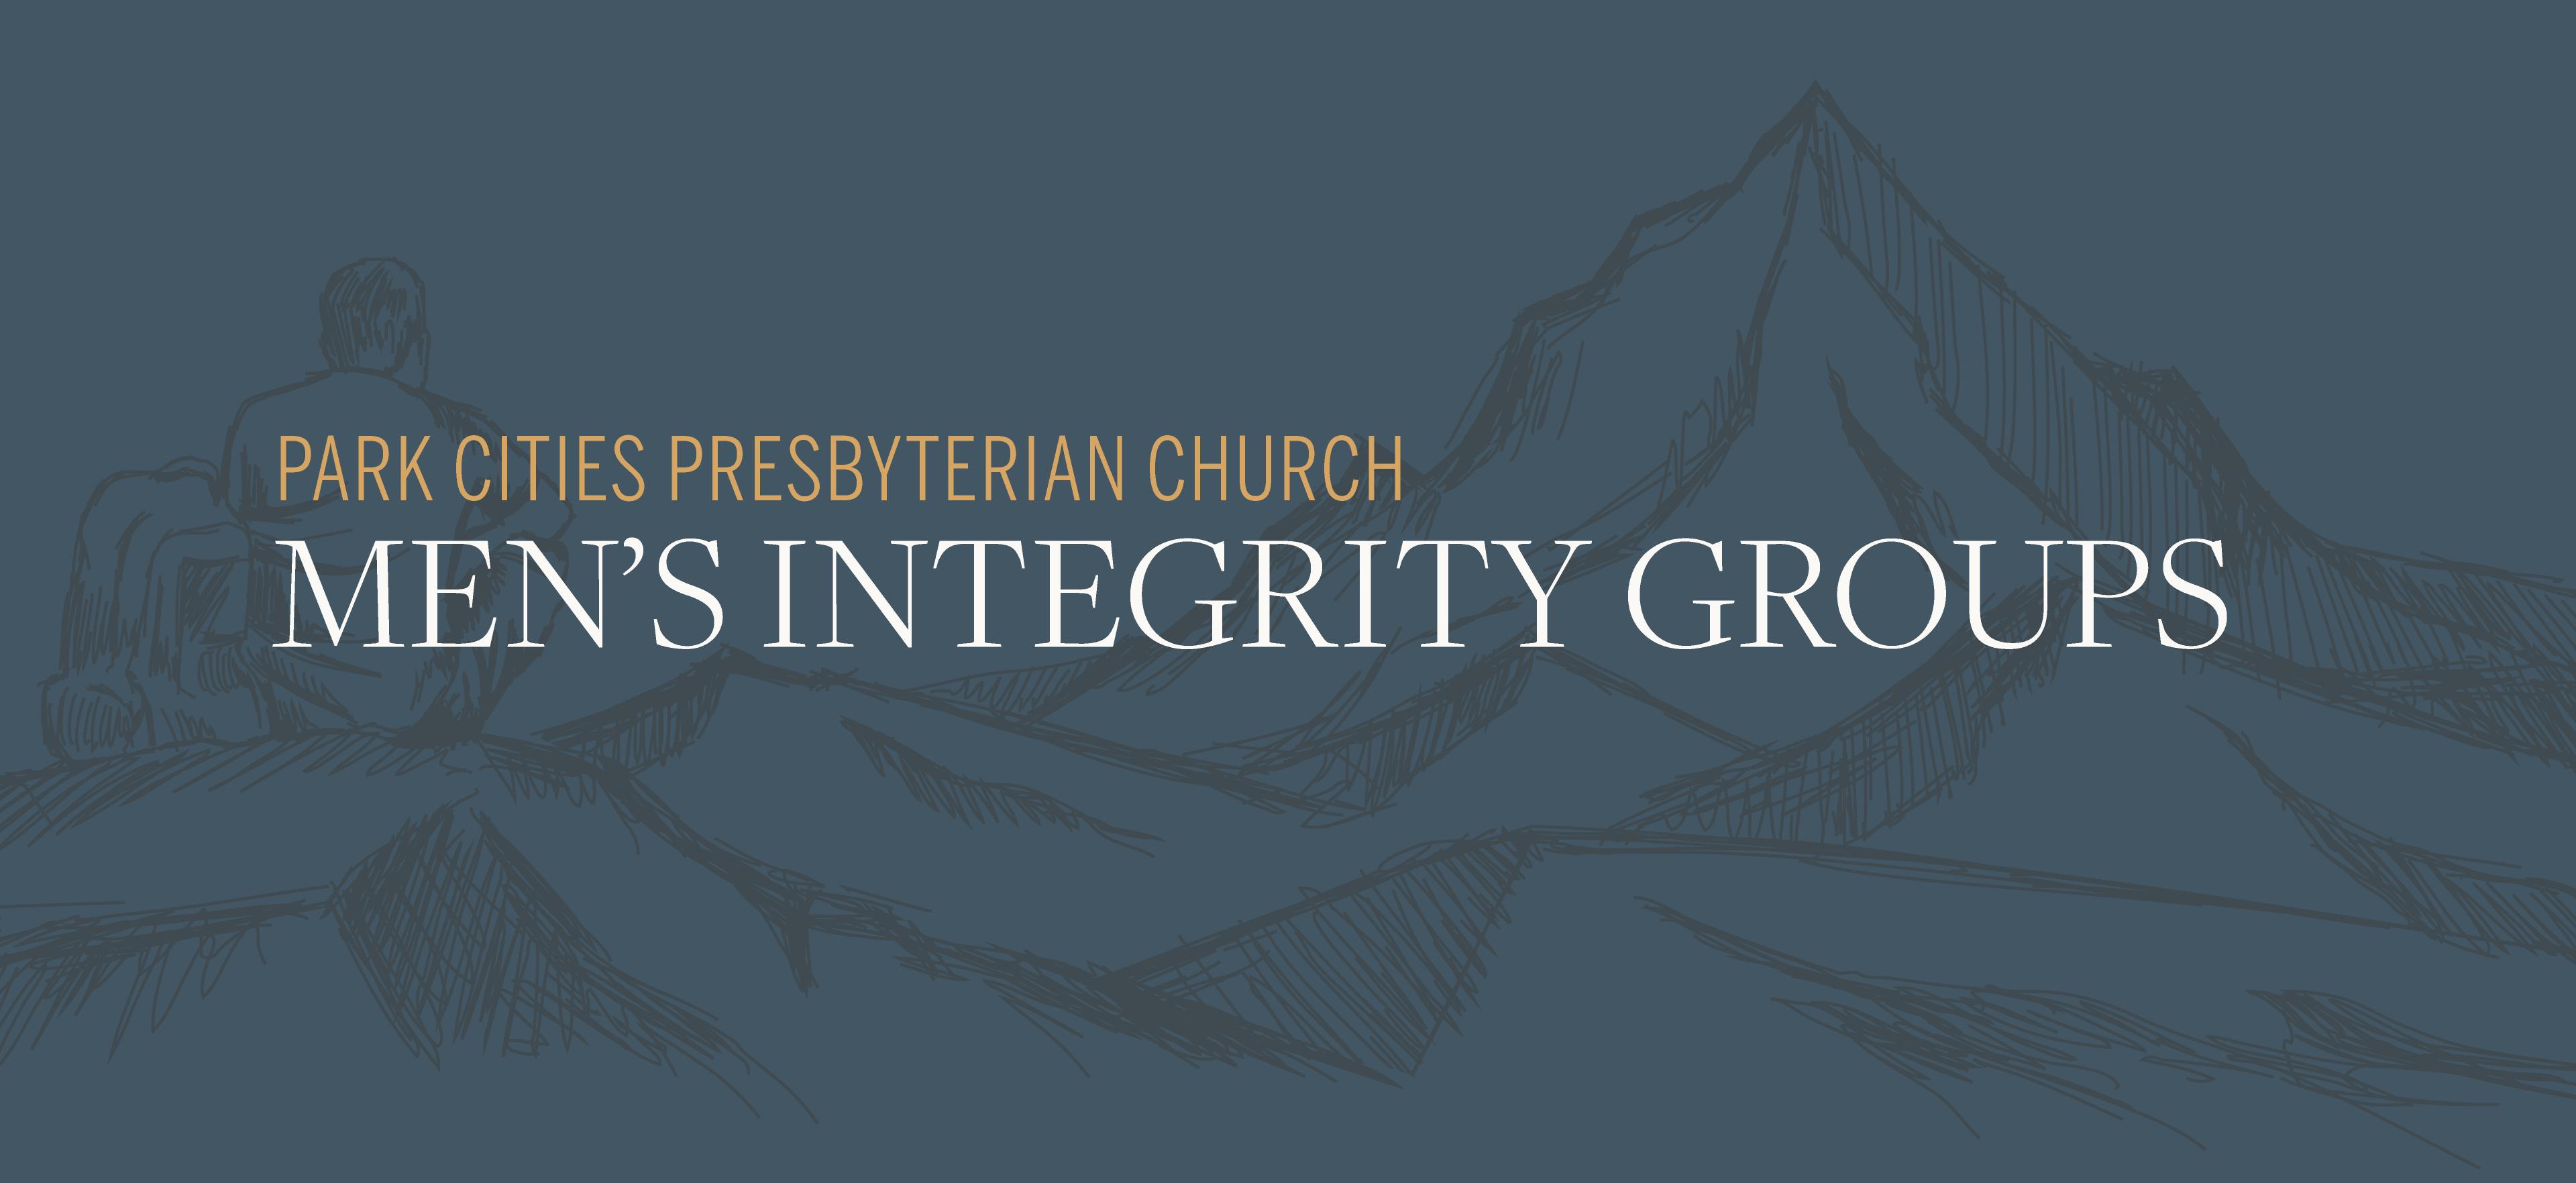 Men's Integrity Groups